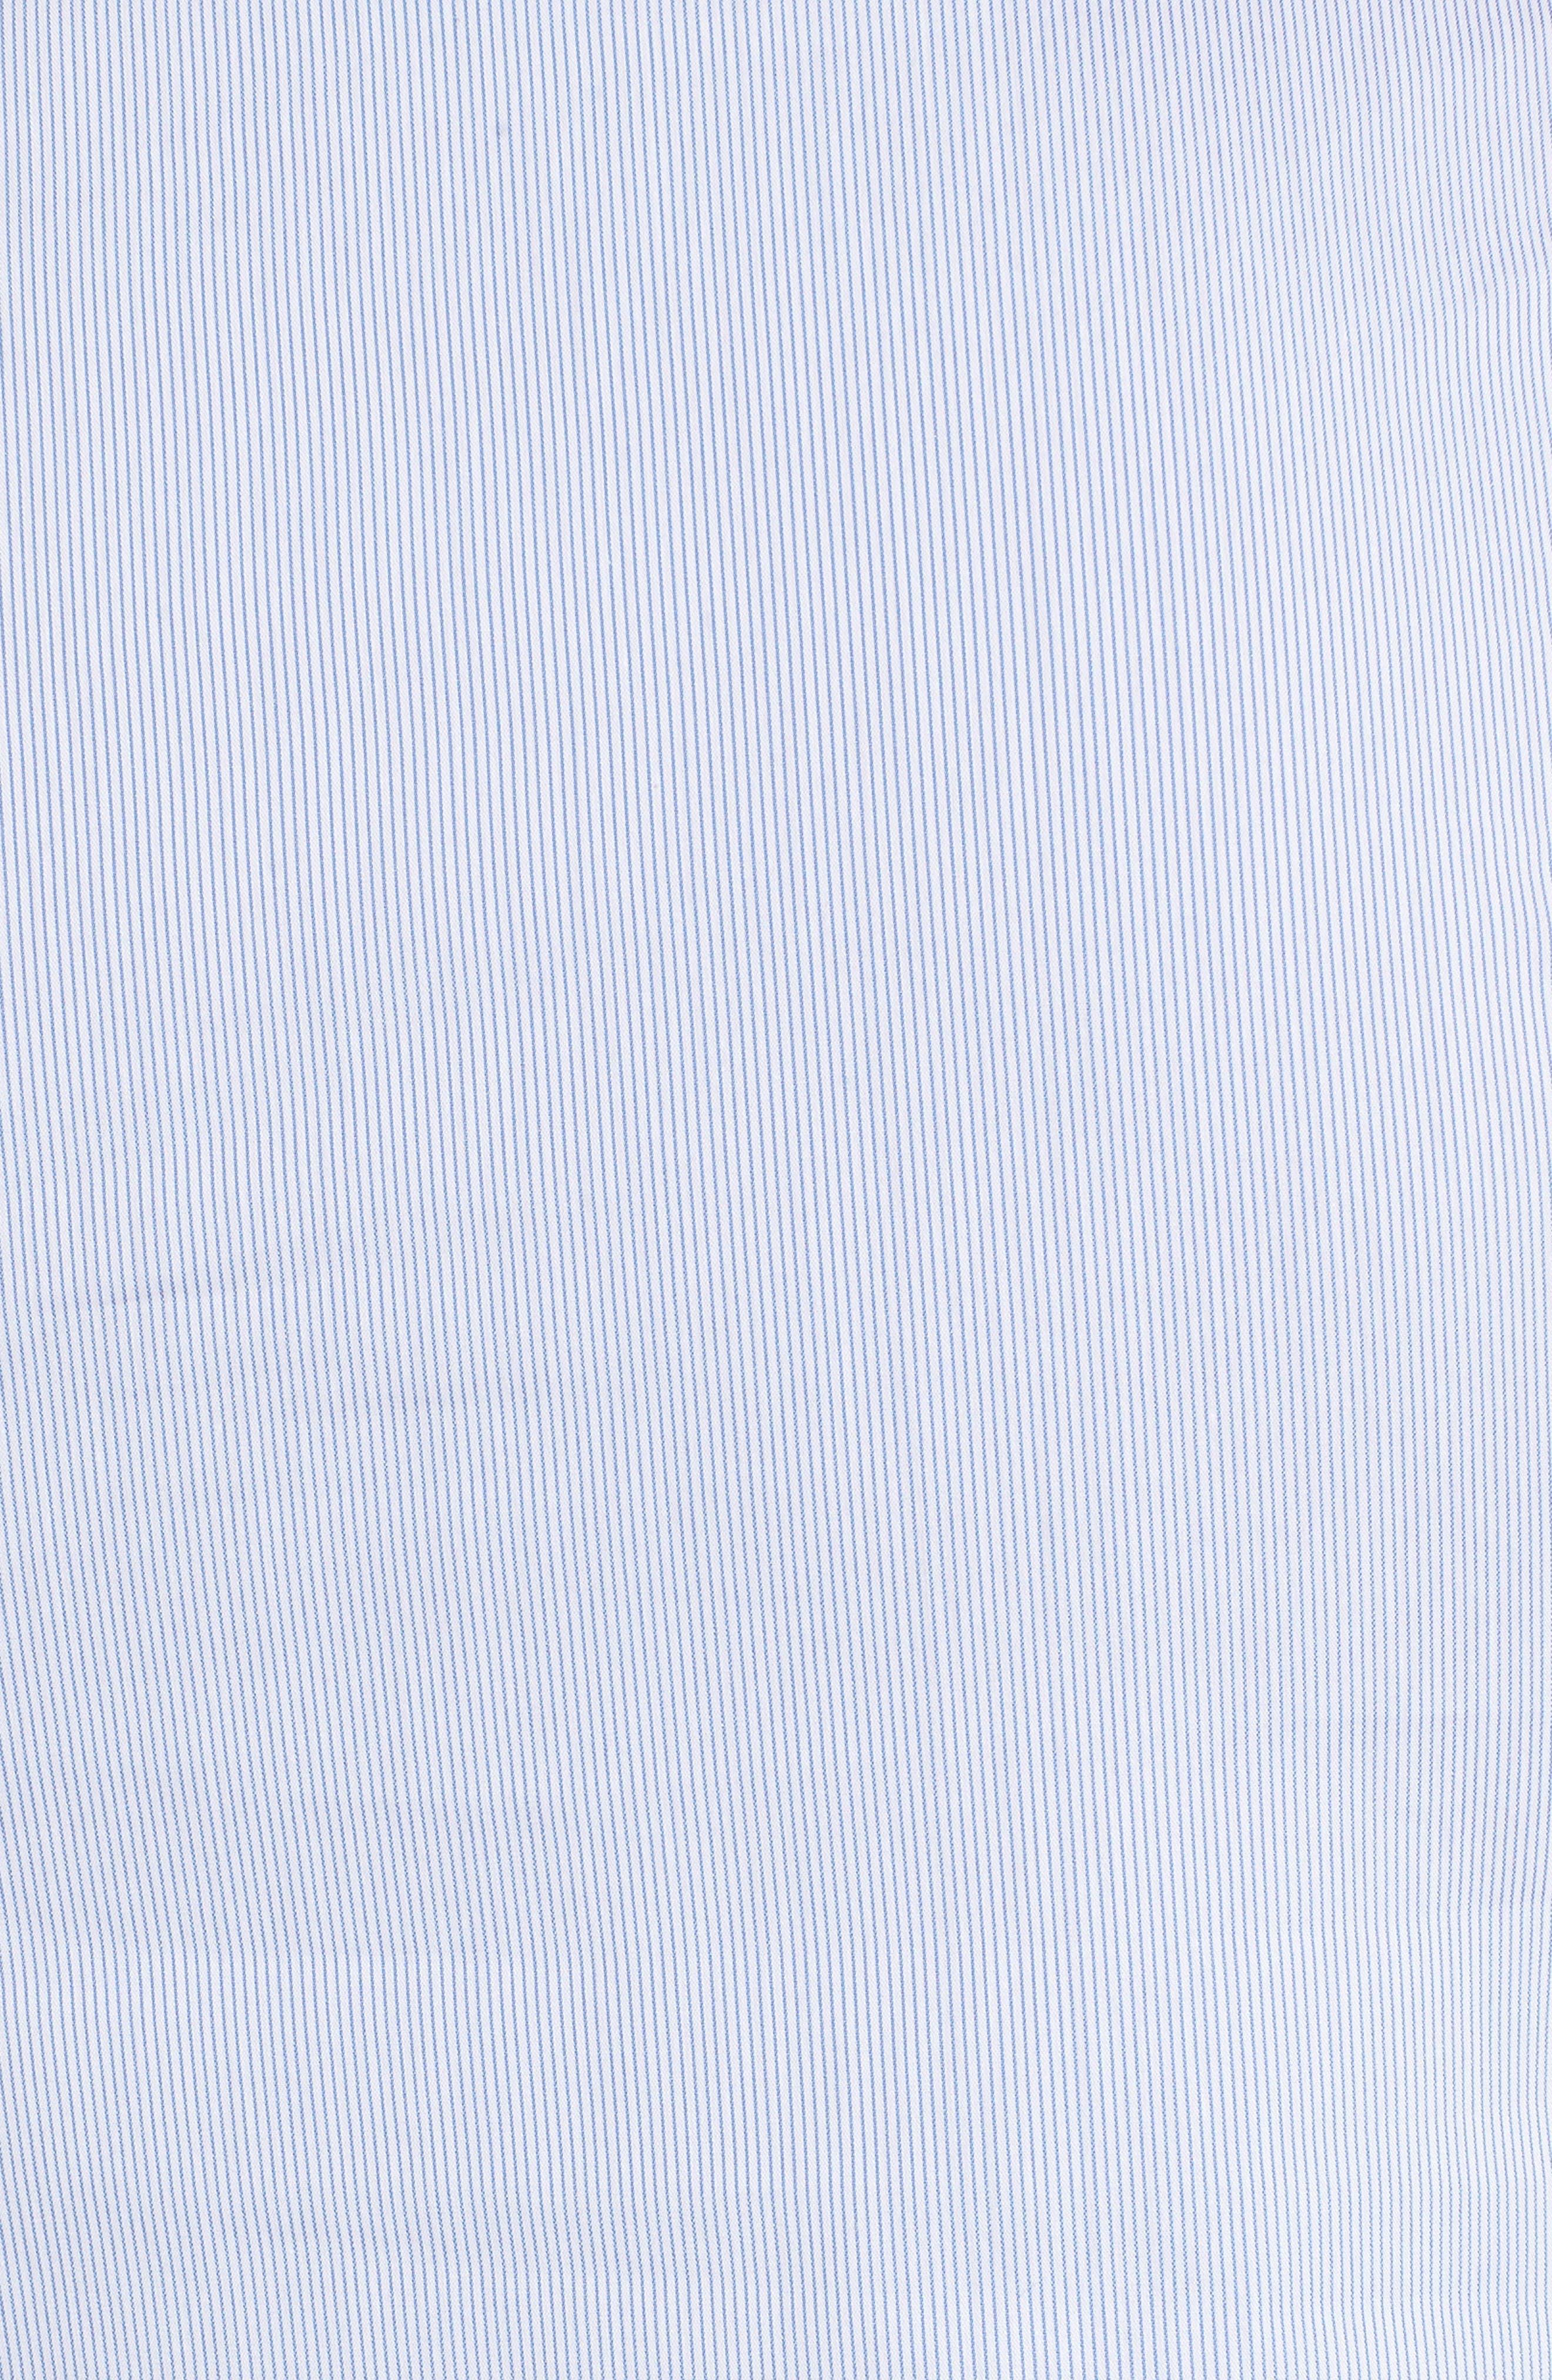 Smocked Puff Sleeve Poplin Top,                             Alternate thumbnail 5, color,                             Blue- White Pinstripe